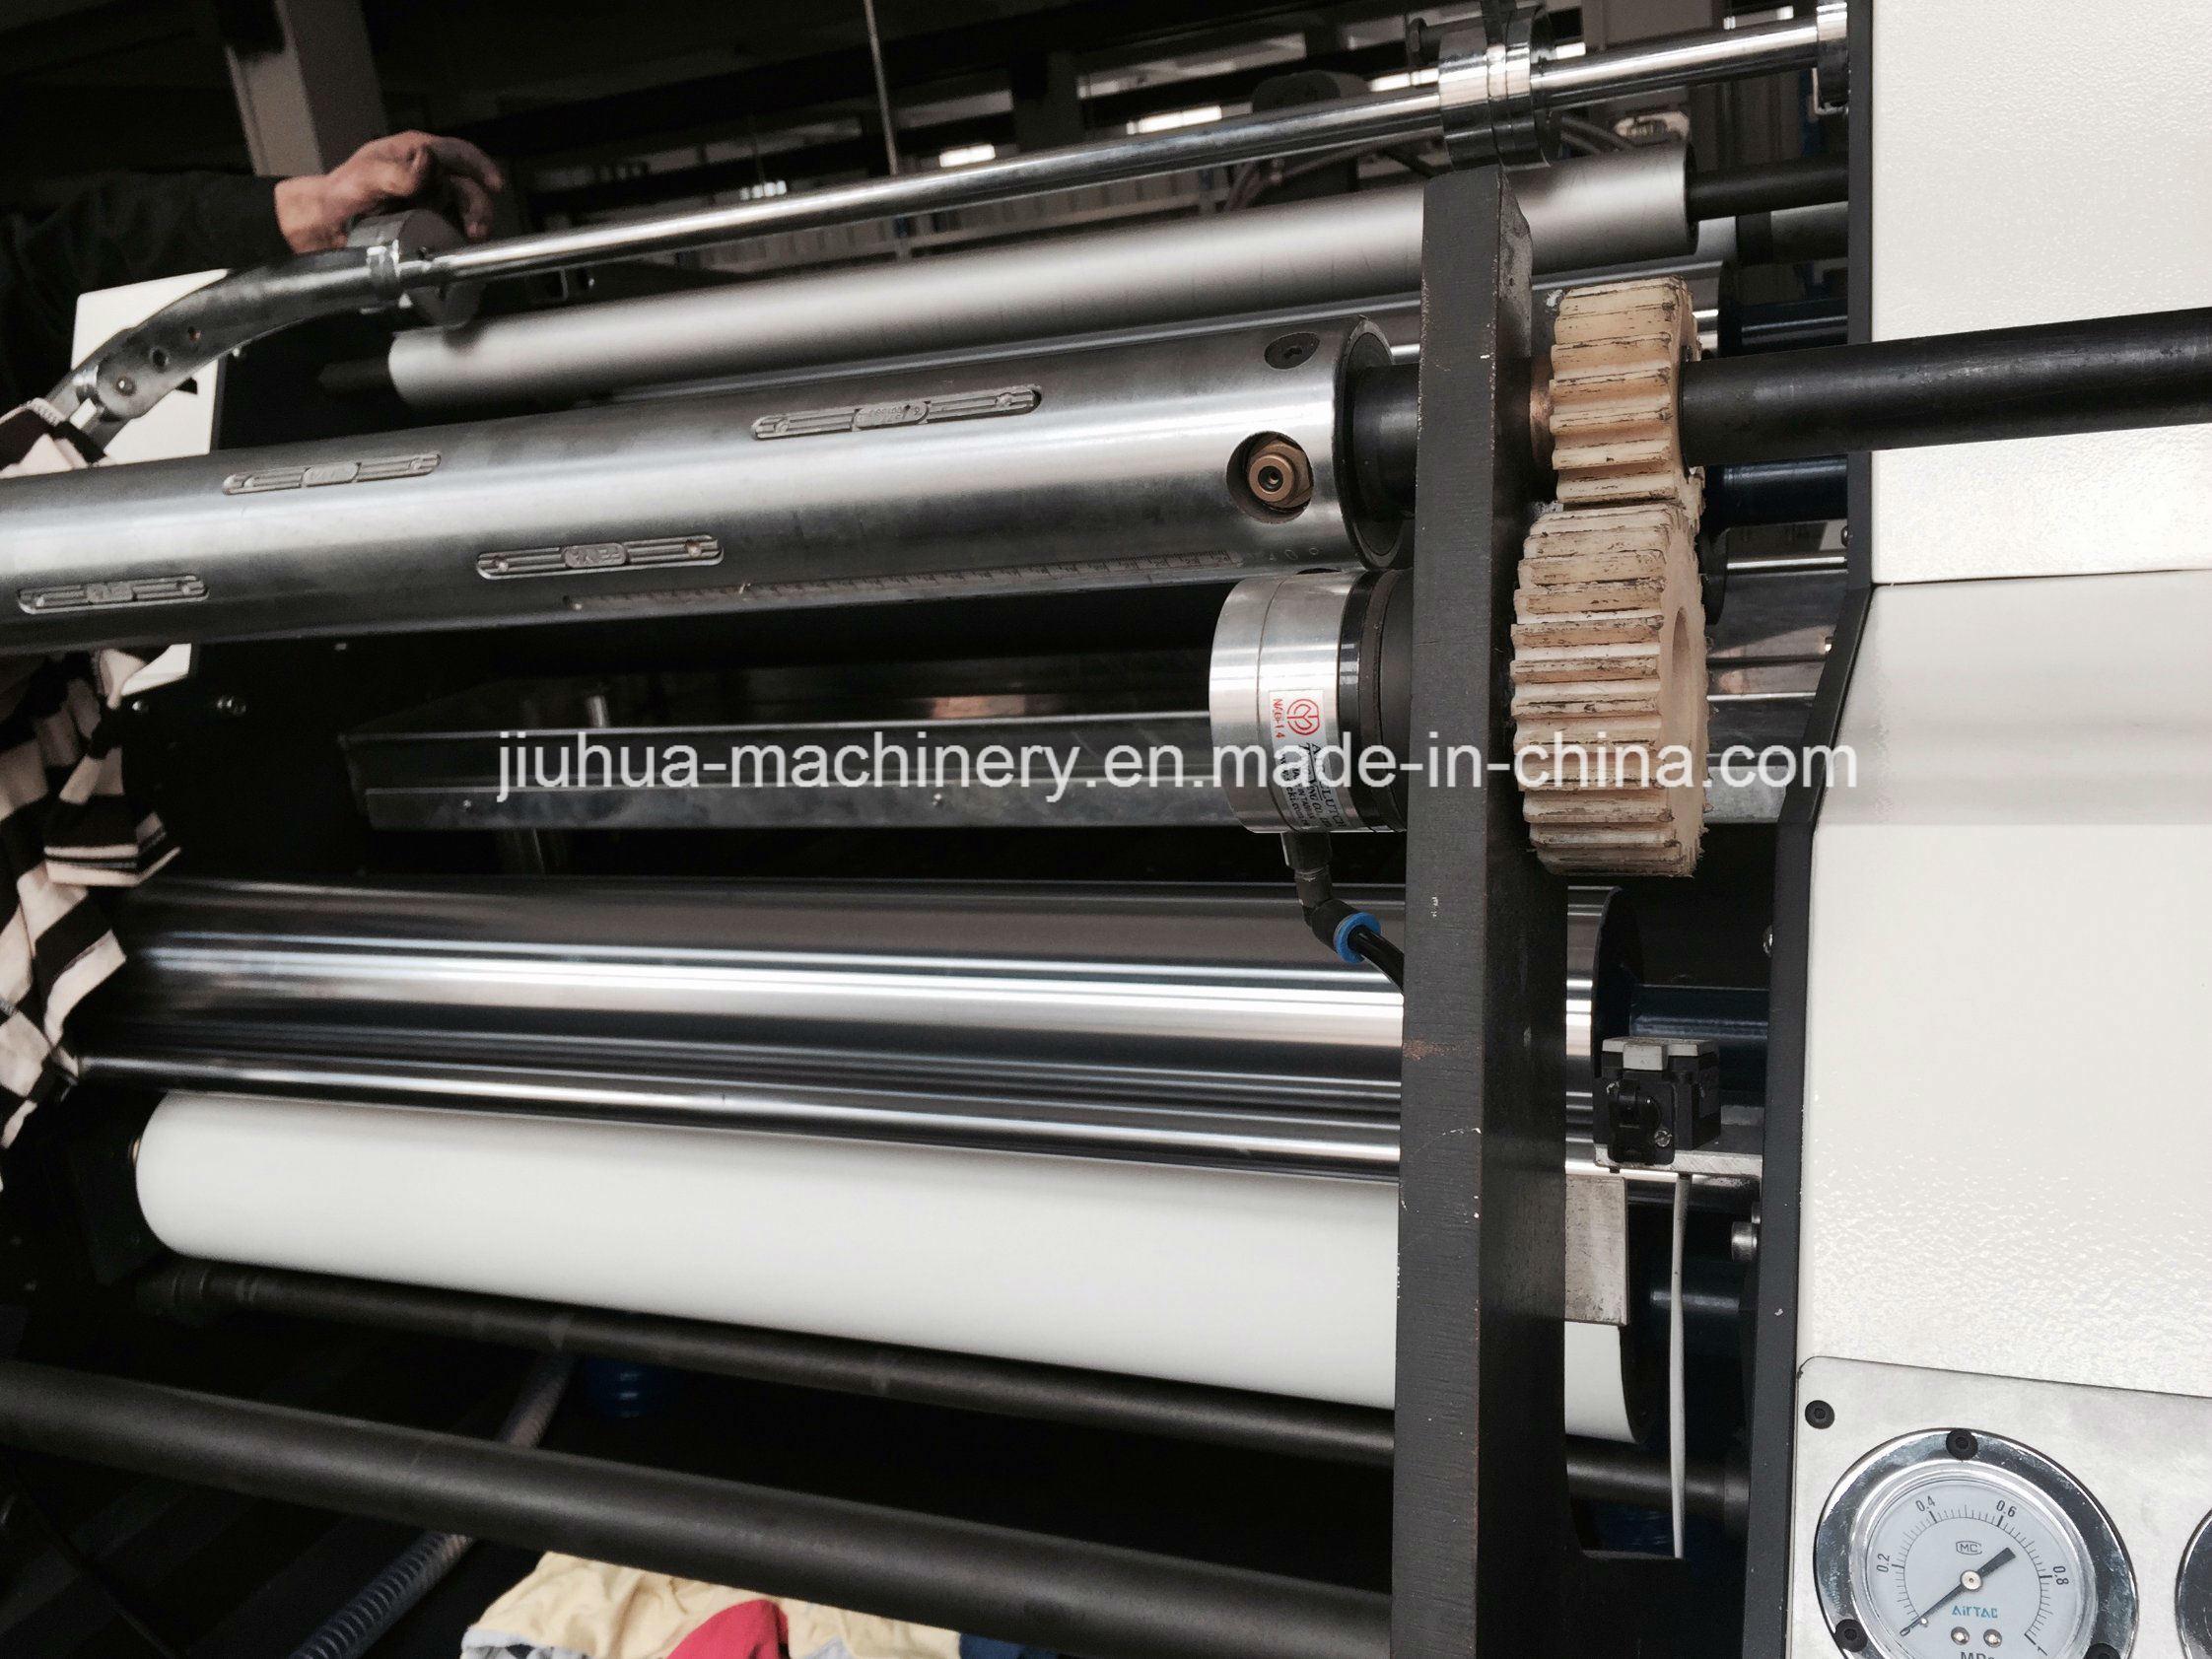 Kfm-Z1100 Automatic Window Water Soluble Laminating Machine for Plastic Film